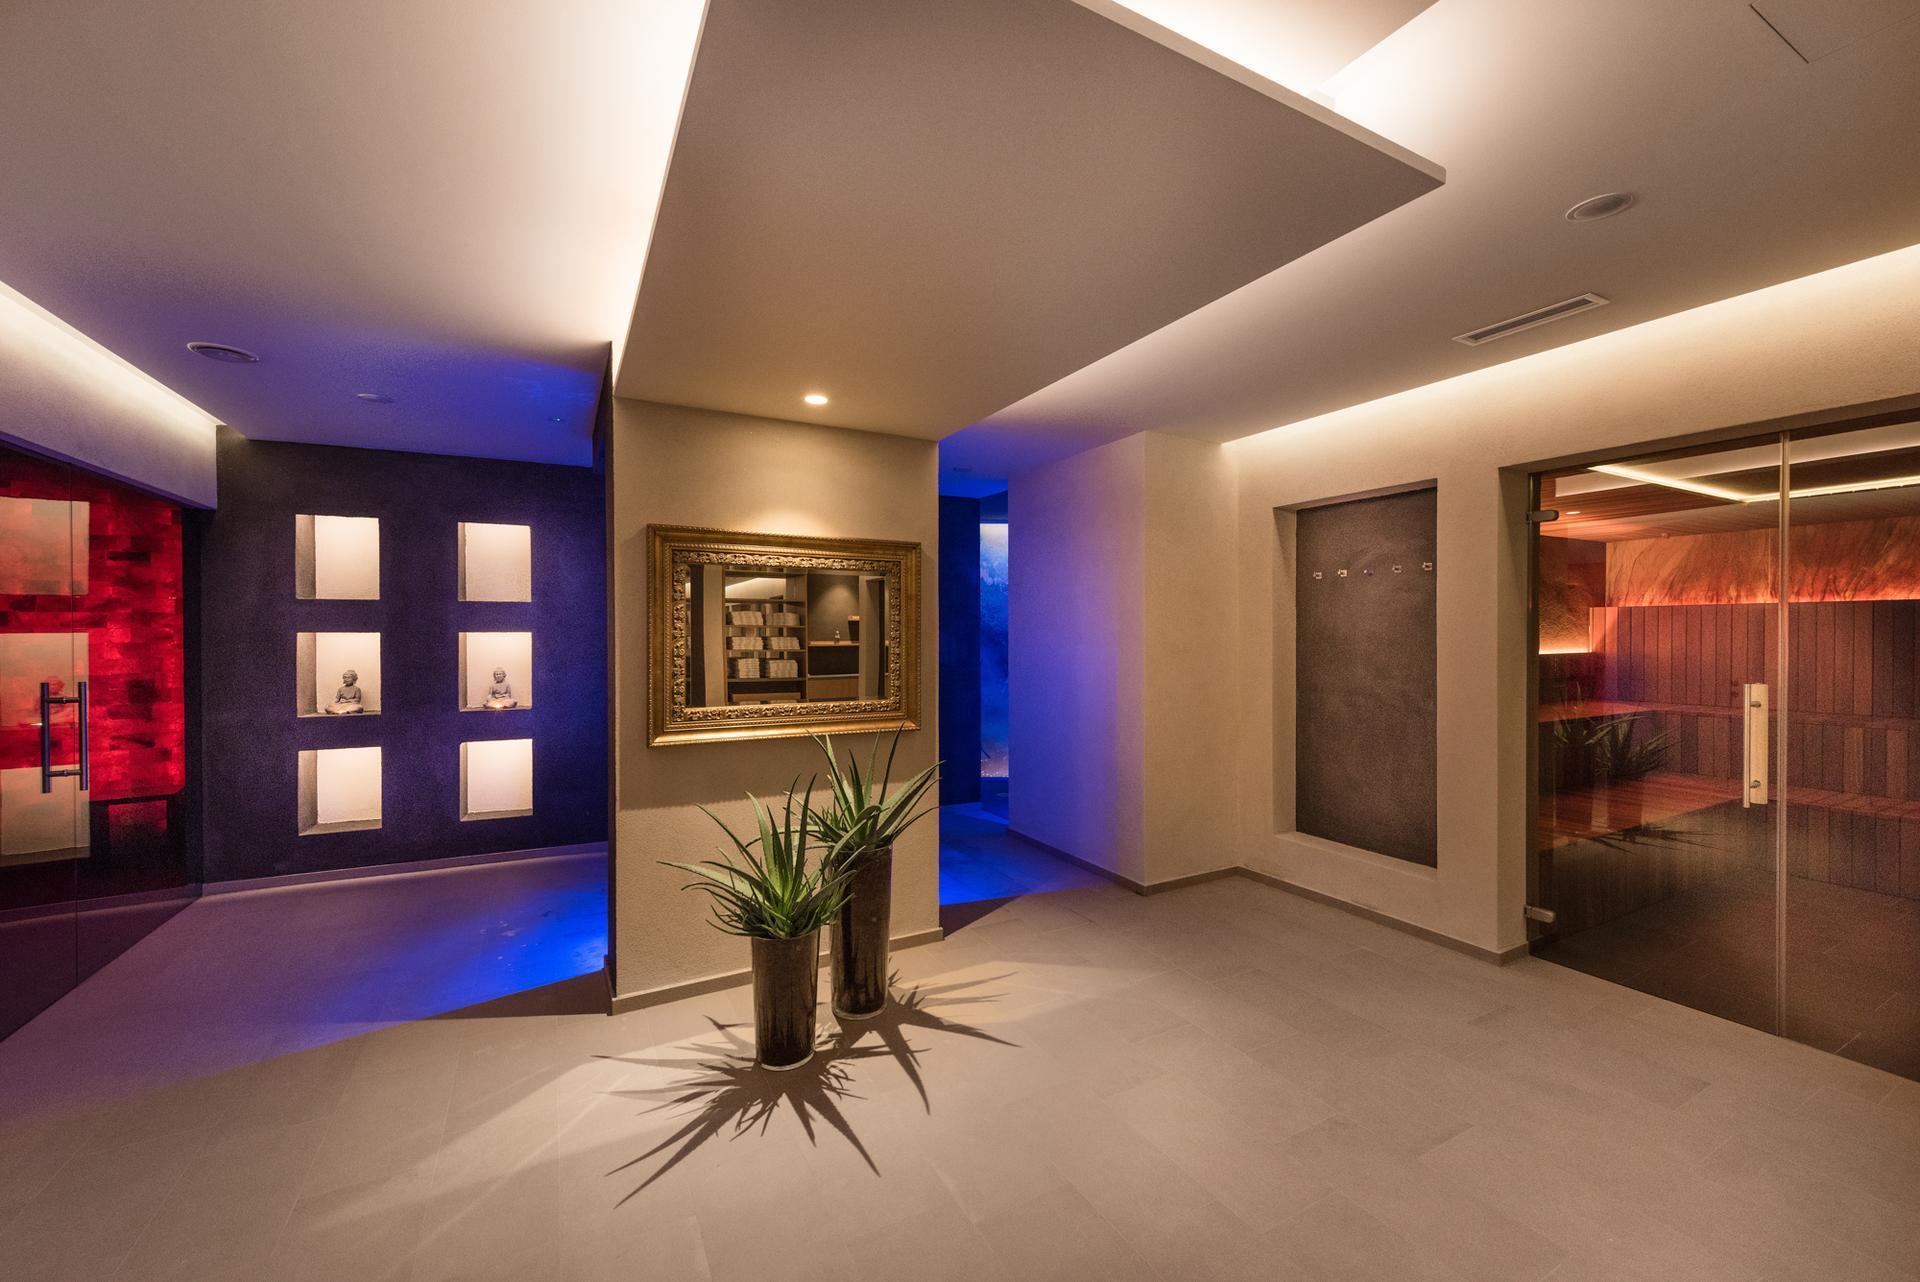 Sauna pool bei meran 4 sterne hotel fayn algund for Design wellnesshotel nrw